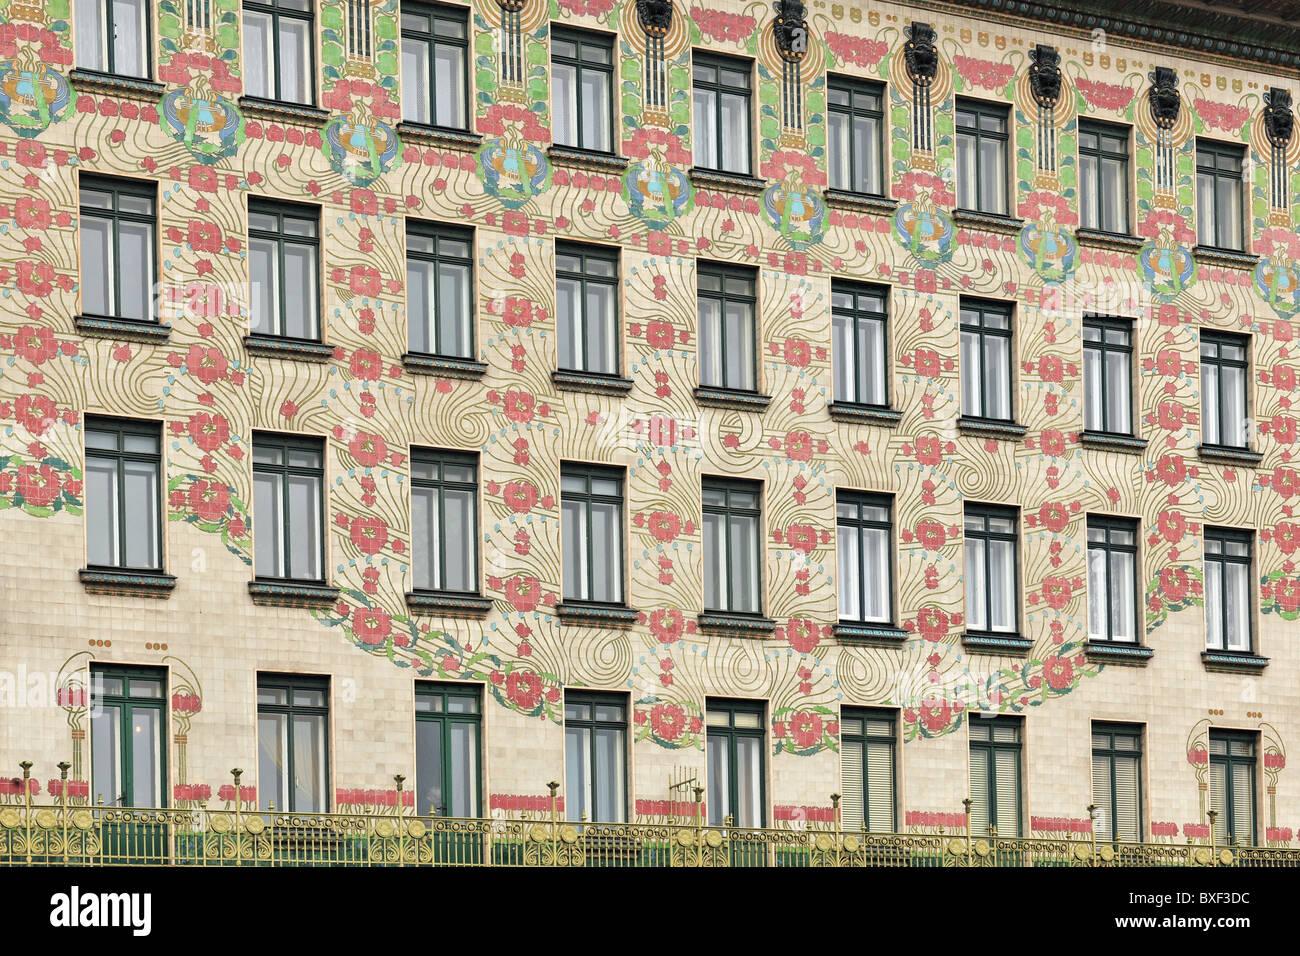 Vienna Austria Majolikahaus Apartment Building Facade 1899 By Modern